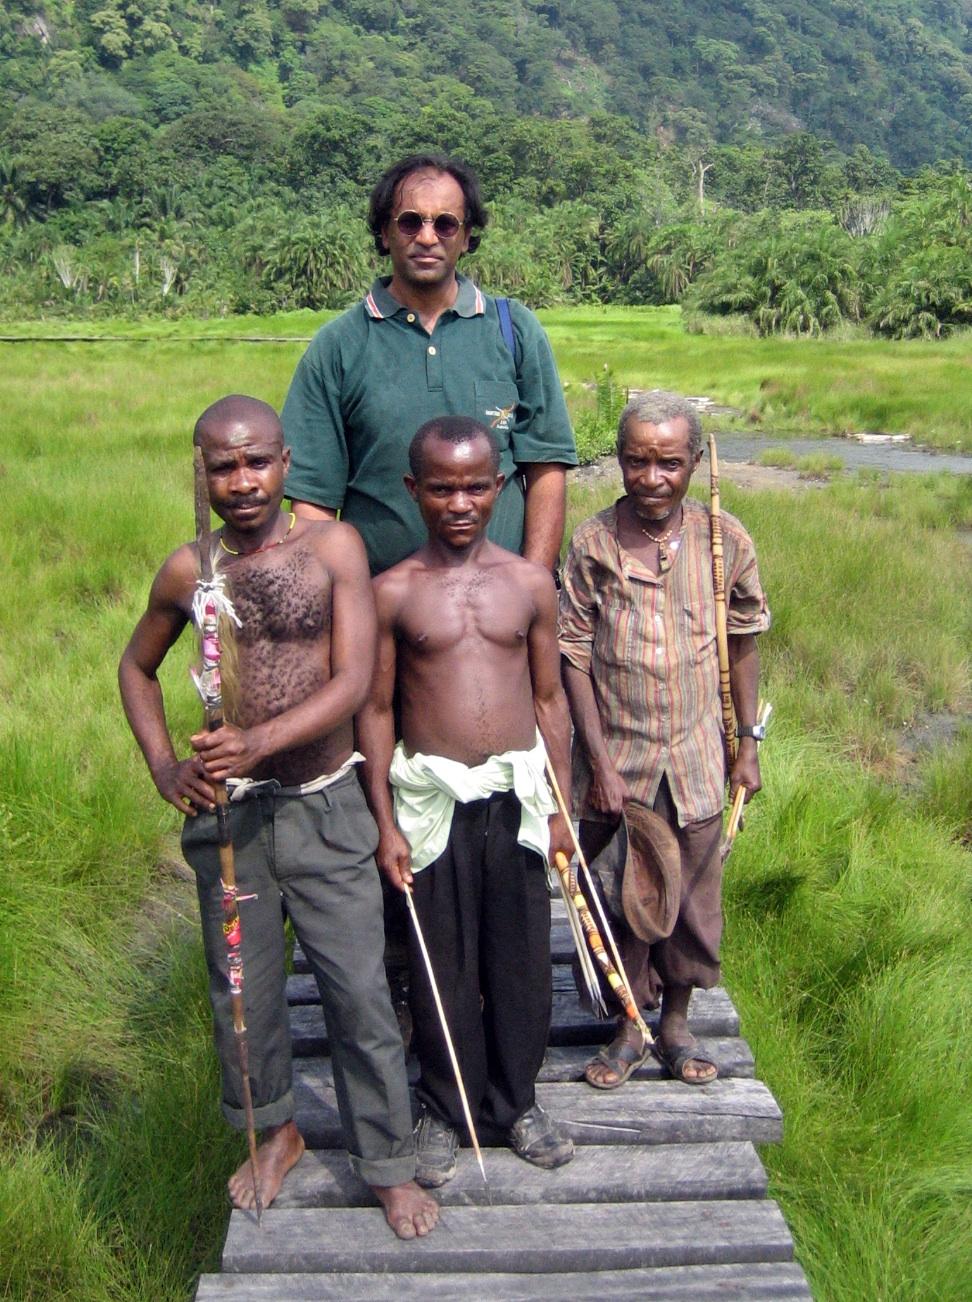 Hitesh with Batwa, a pygmy tribe, in Uganda.